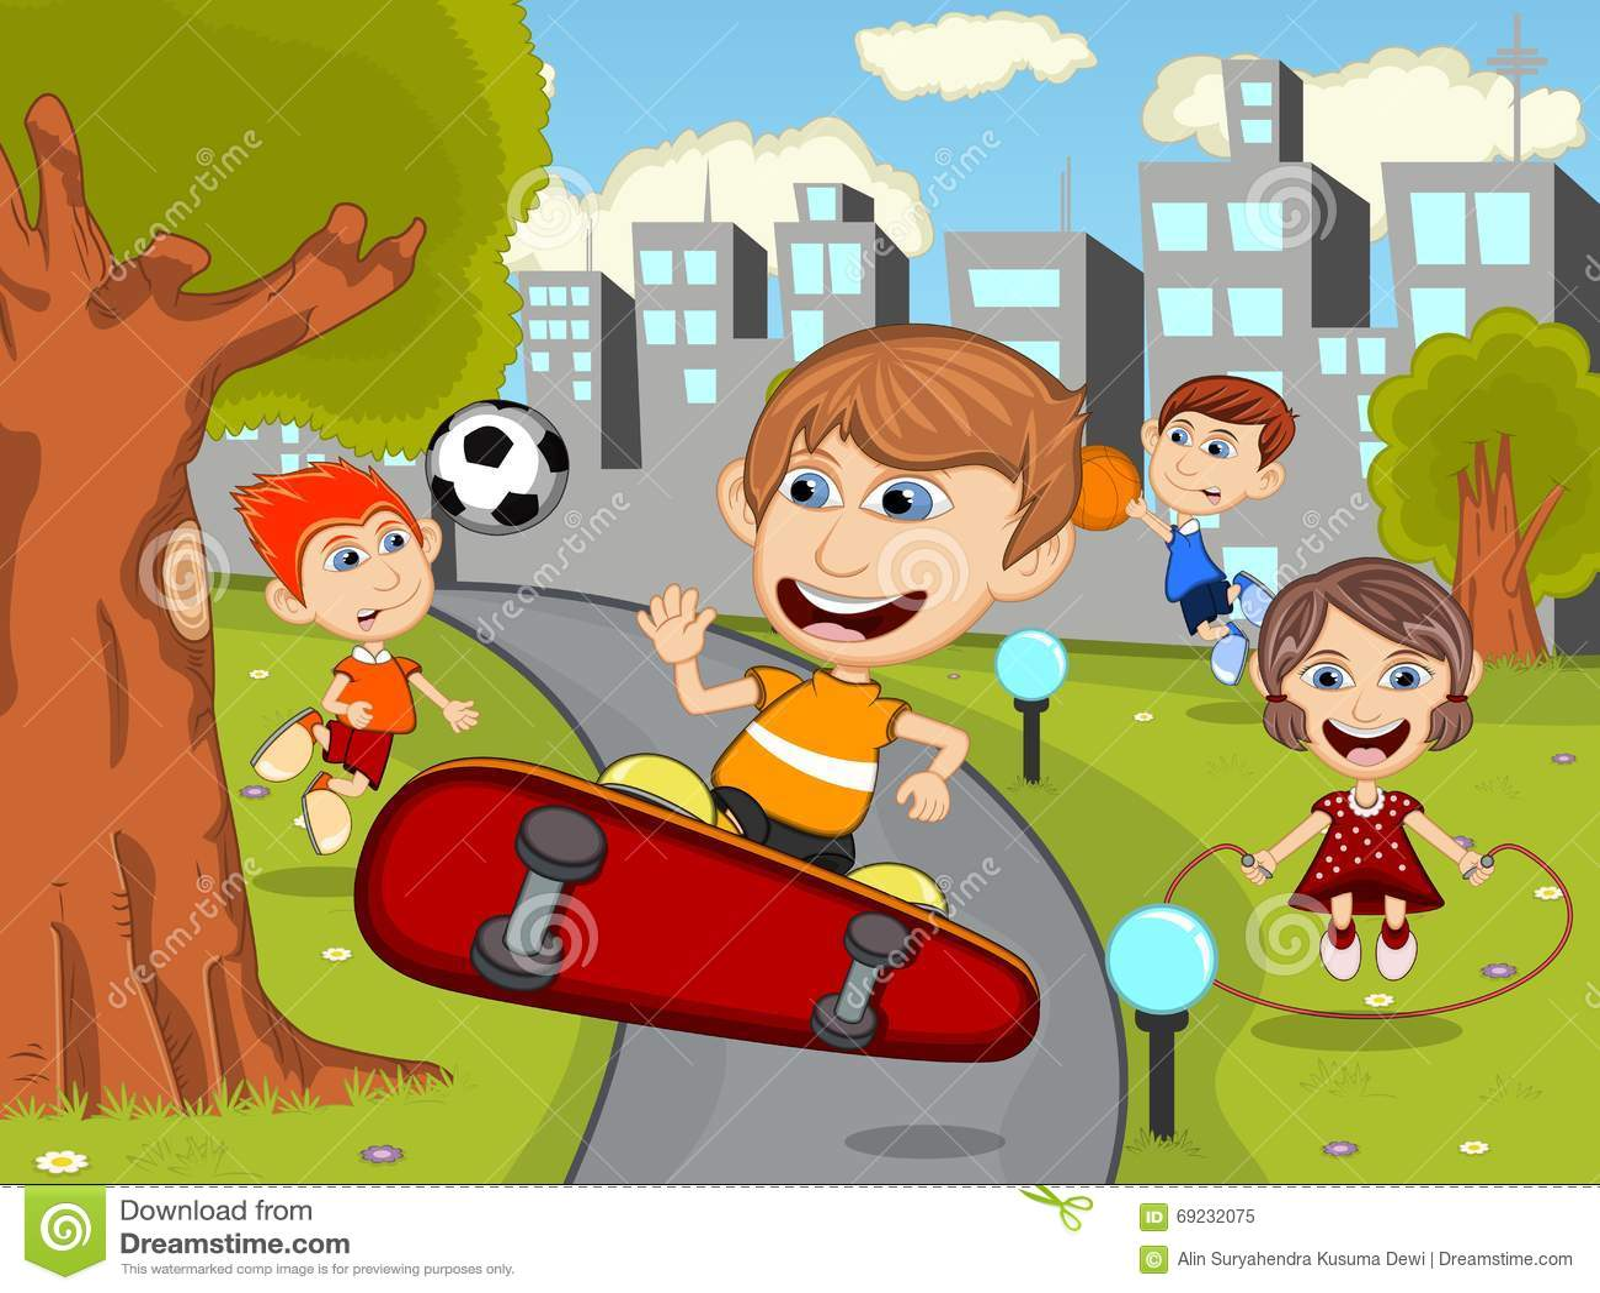 Cute Happy Cartoon Kids Playing Skate Board Soccer Jumping Rope